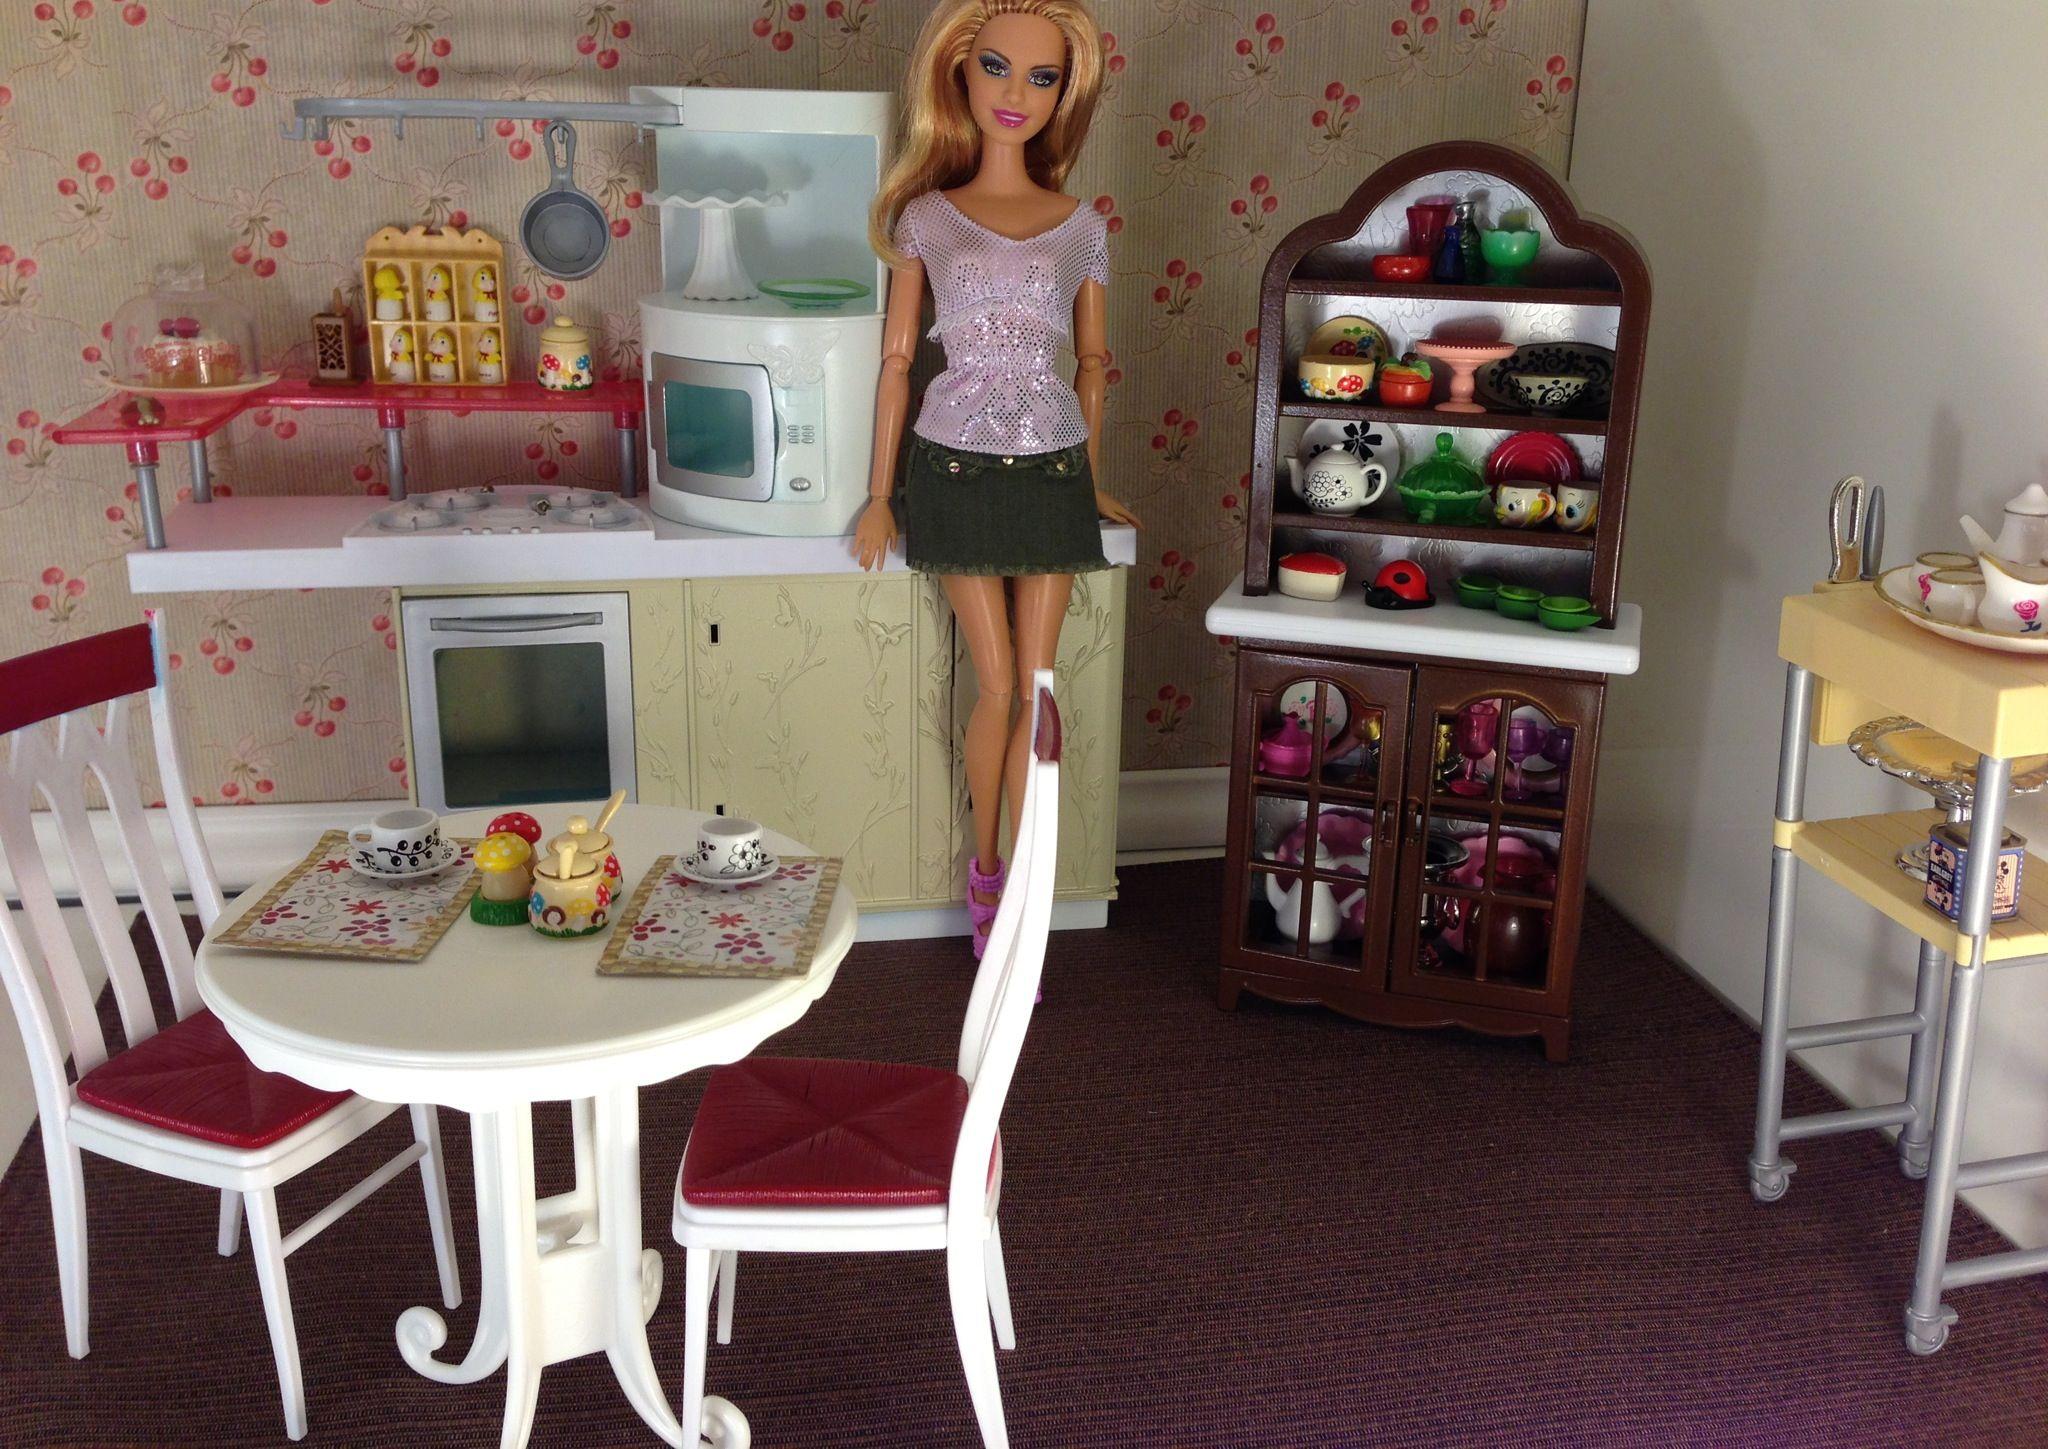 Barbie Dolls Hello Dreamhouse Dollhouse W Kitchen: Barbie Enjoying Her New Repainted Kitchen